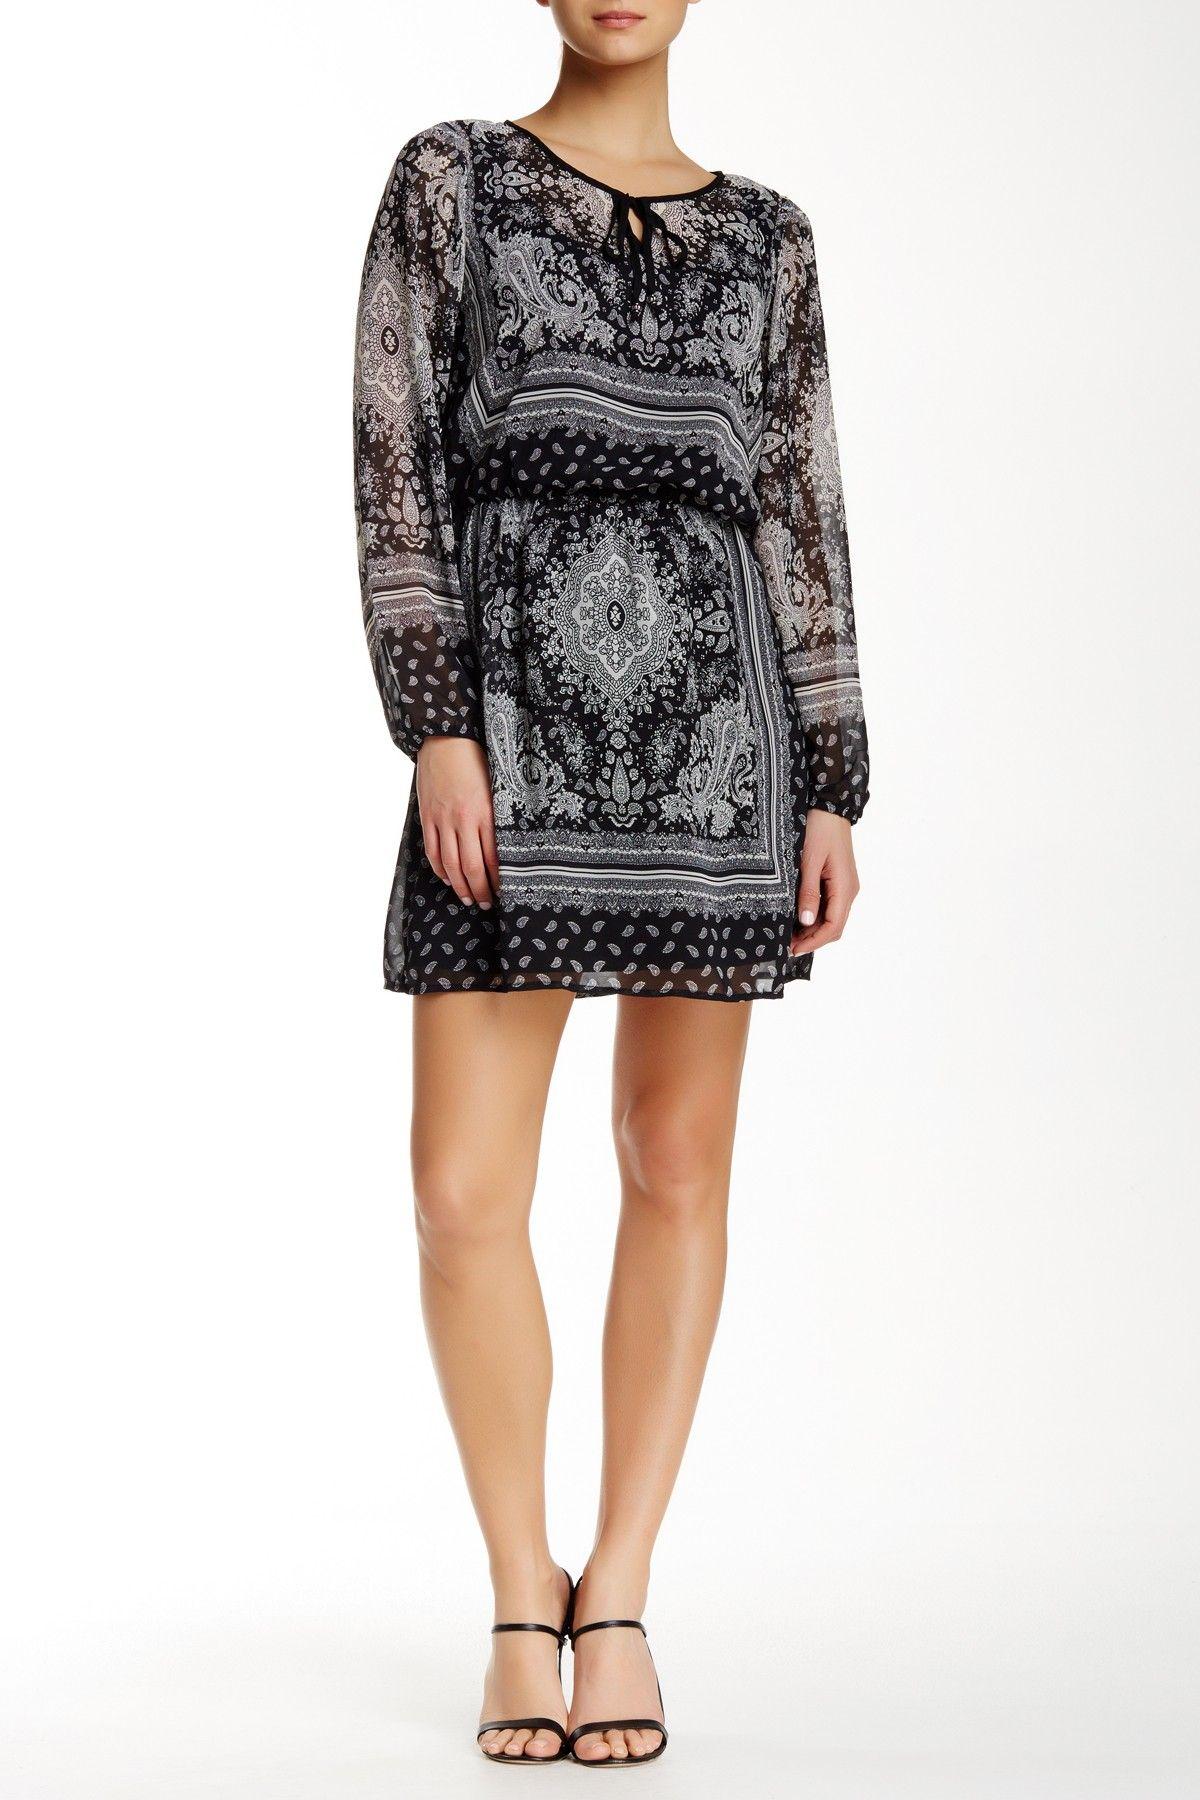 Long Sleeve Printed Chiffon Dress by BE BOP on @nordstrom_rack